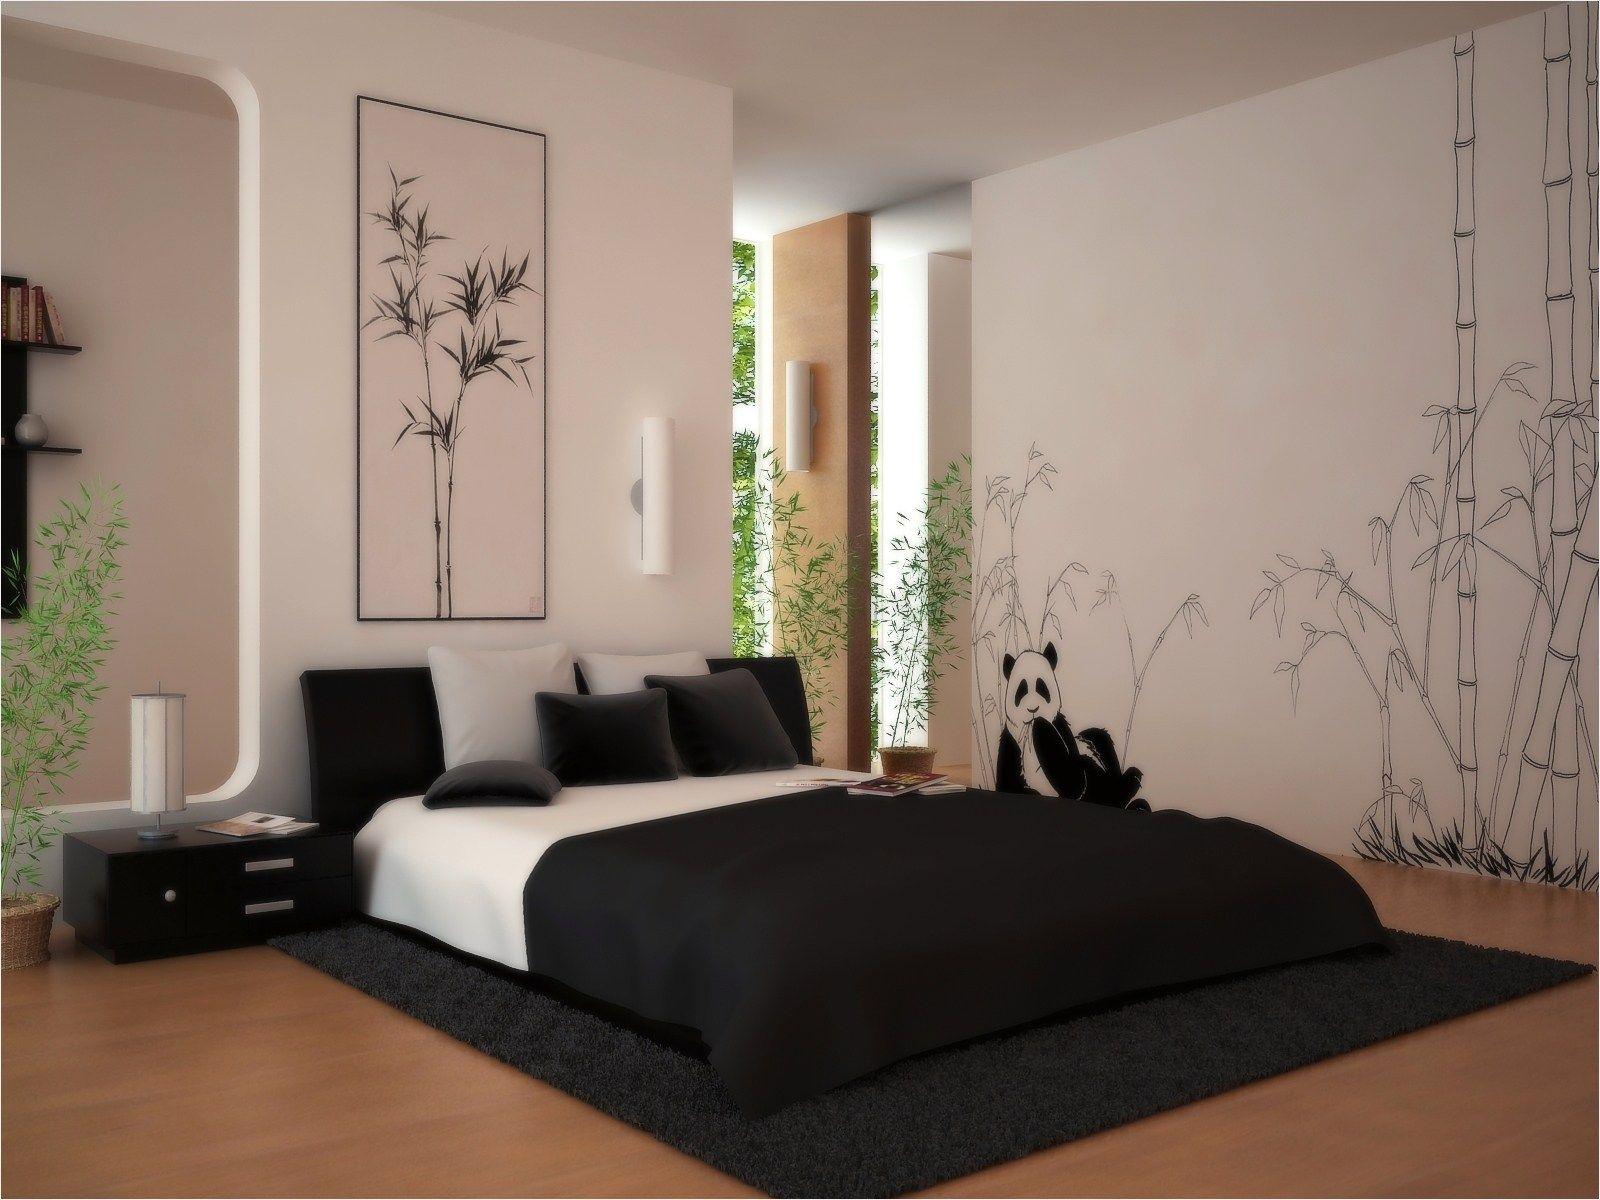 43 Stunning Bedroom Wall Decorating Ideas For Teenagers Decorequired Desain Interior Ide Kamar Tidur Interior